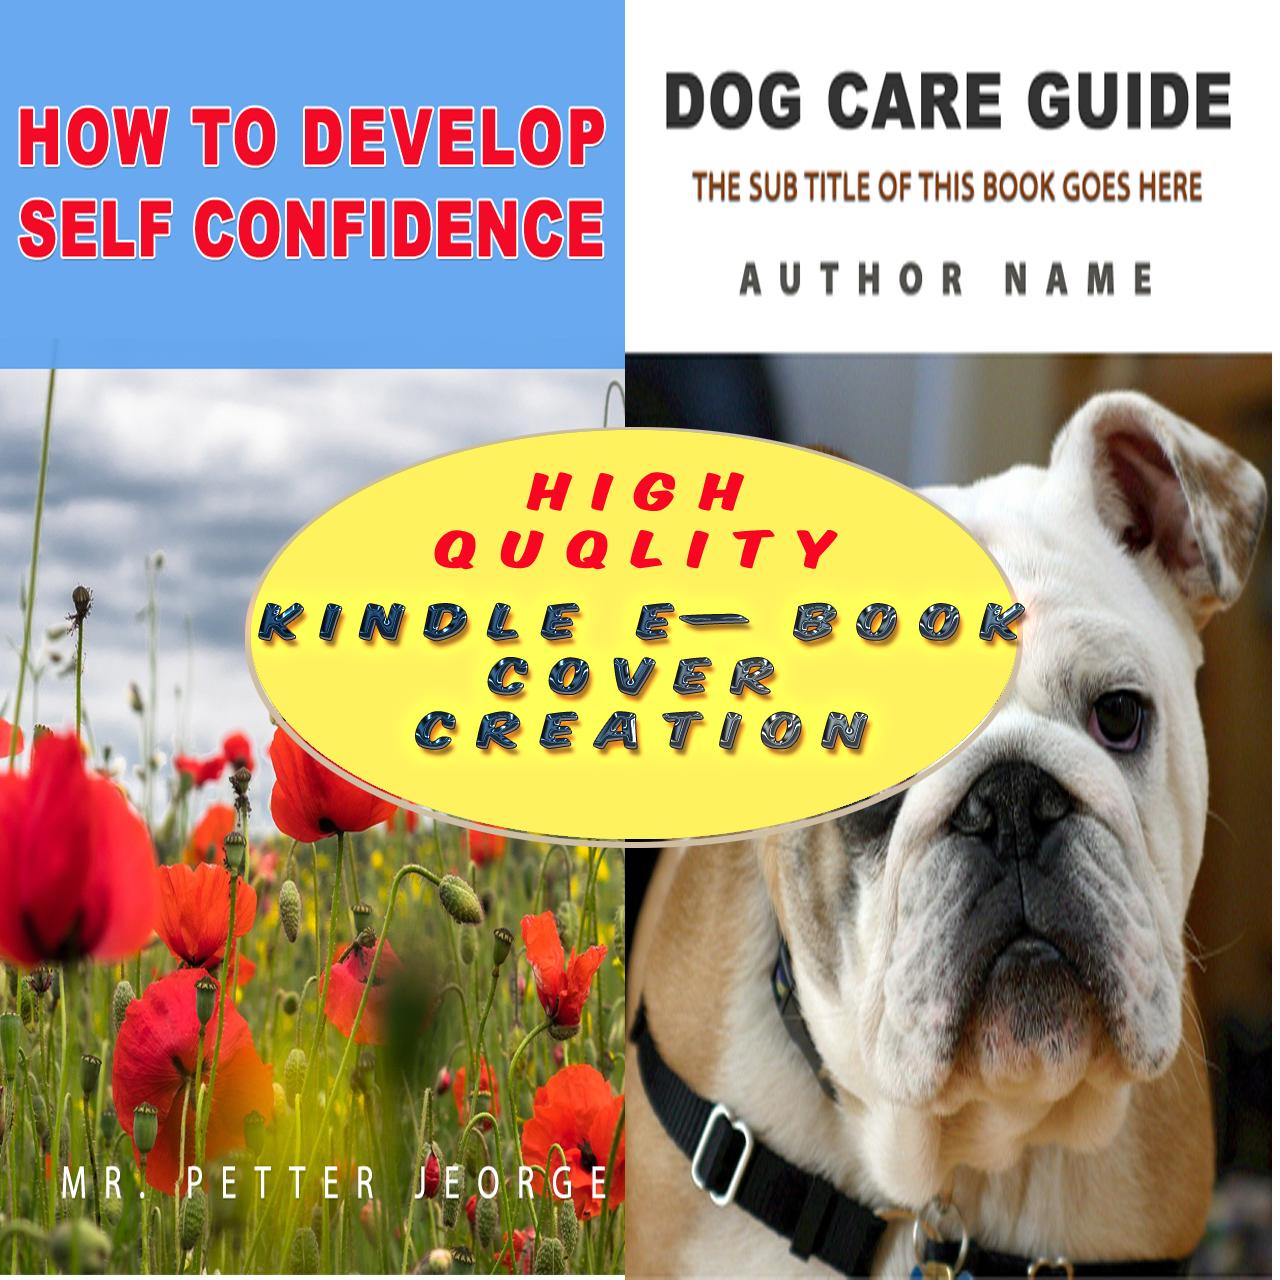 I will create a professional kindle ebook cover